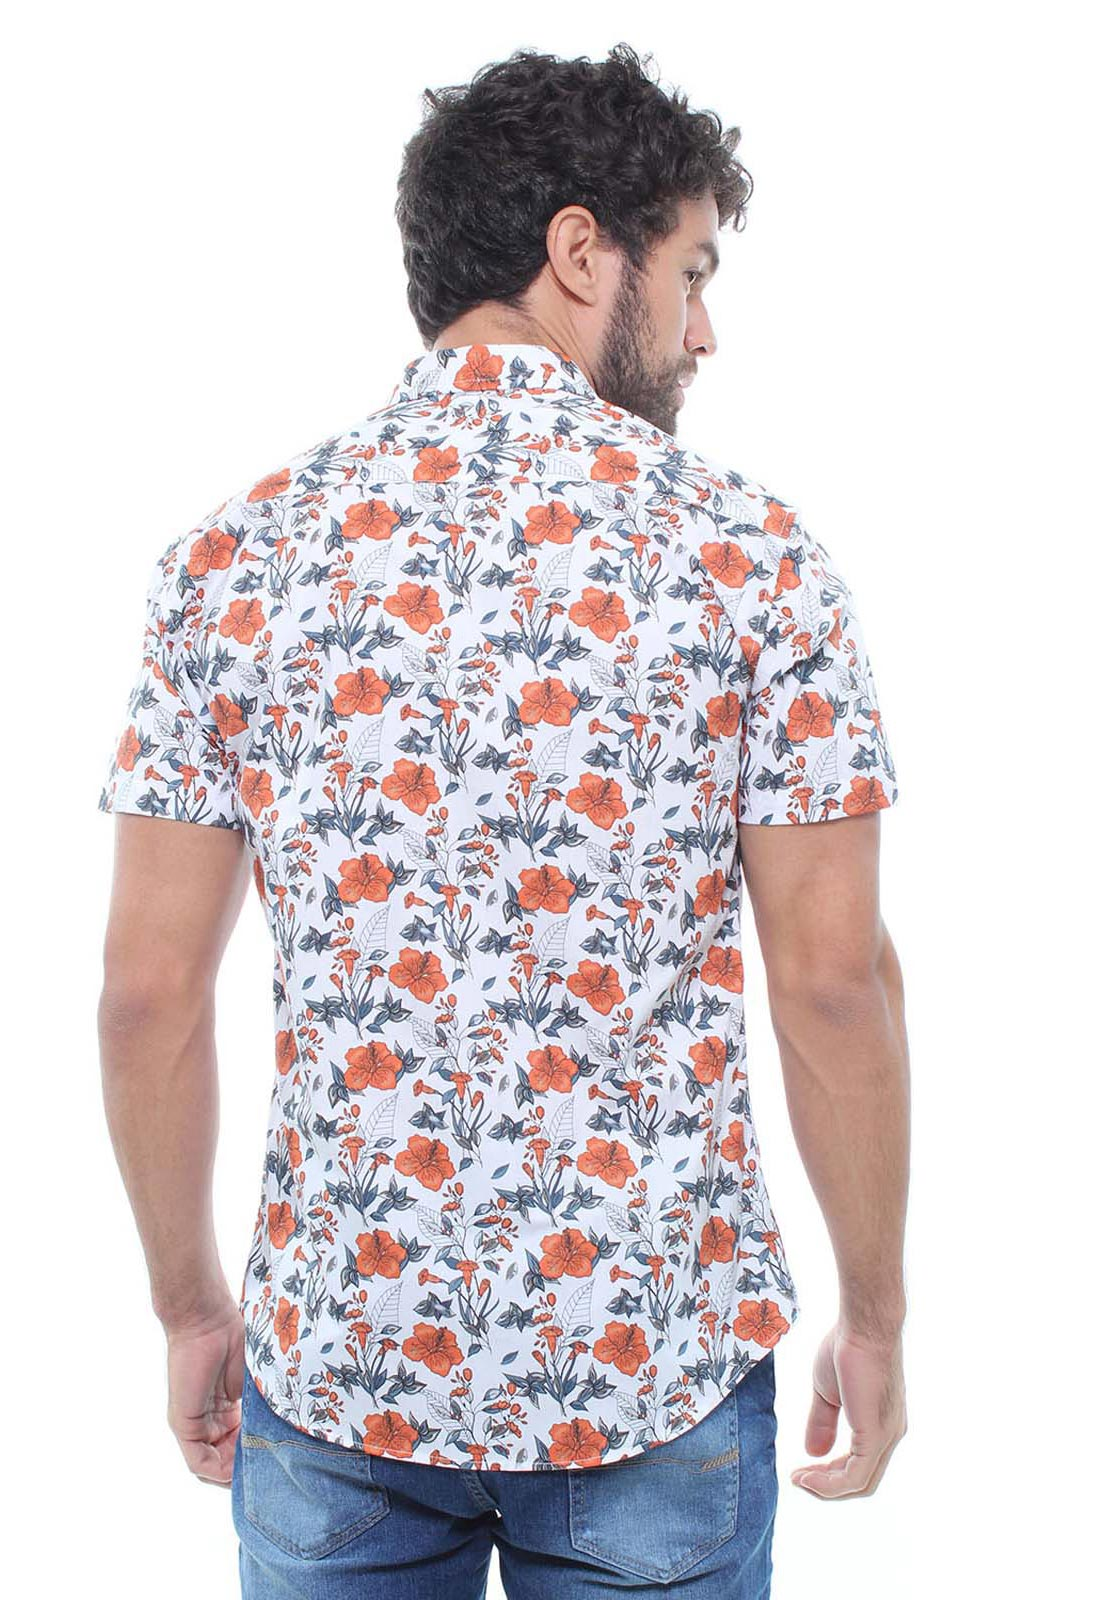 Camisa Estampada Masculina Manga Curta Crocker -  47934  - CROCKER JEANS